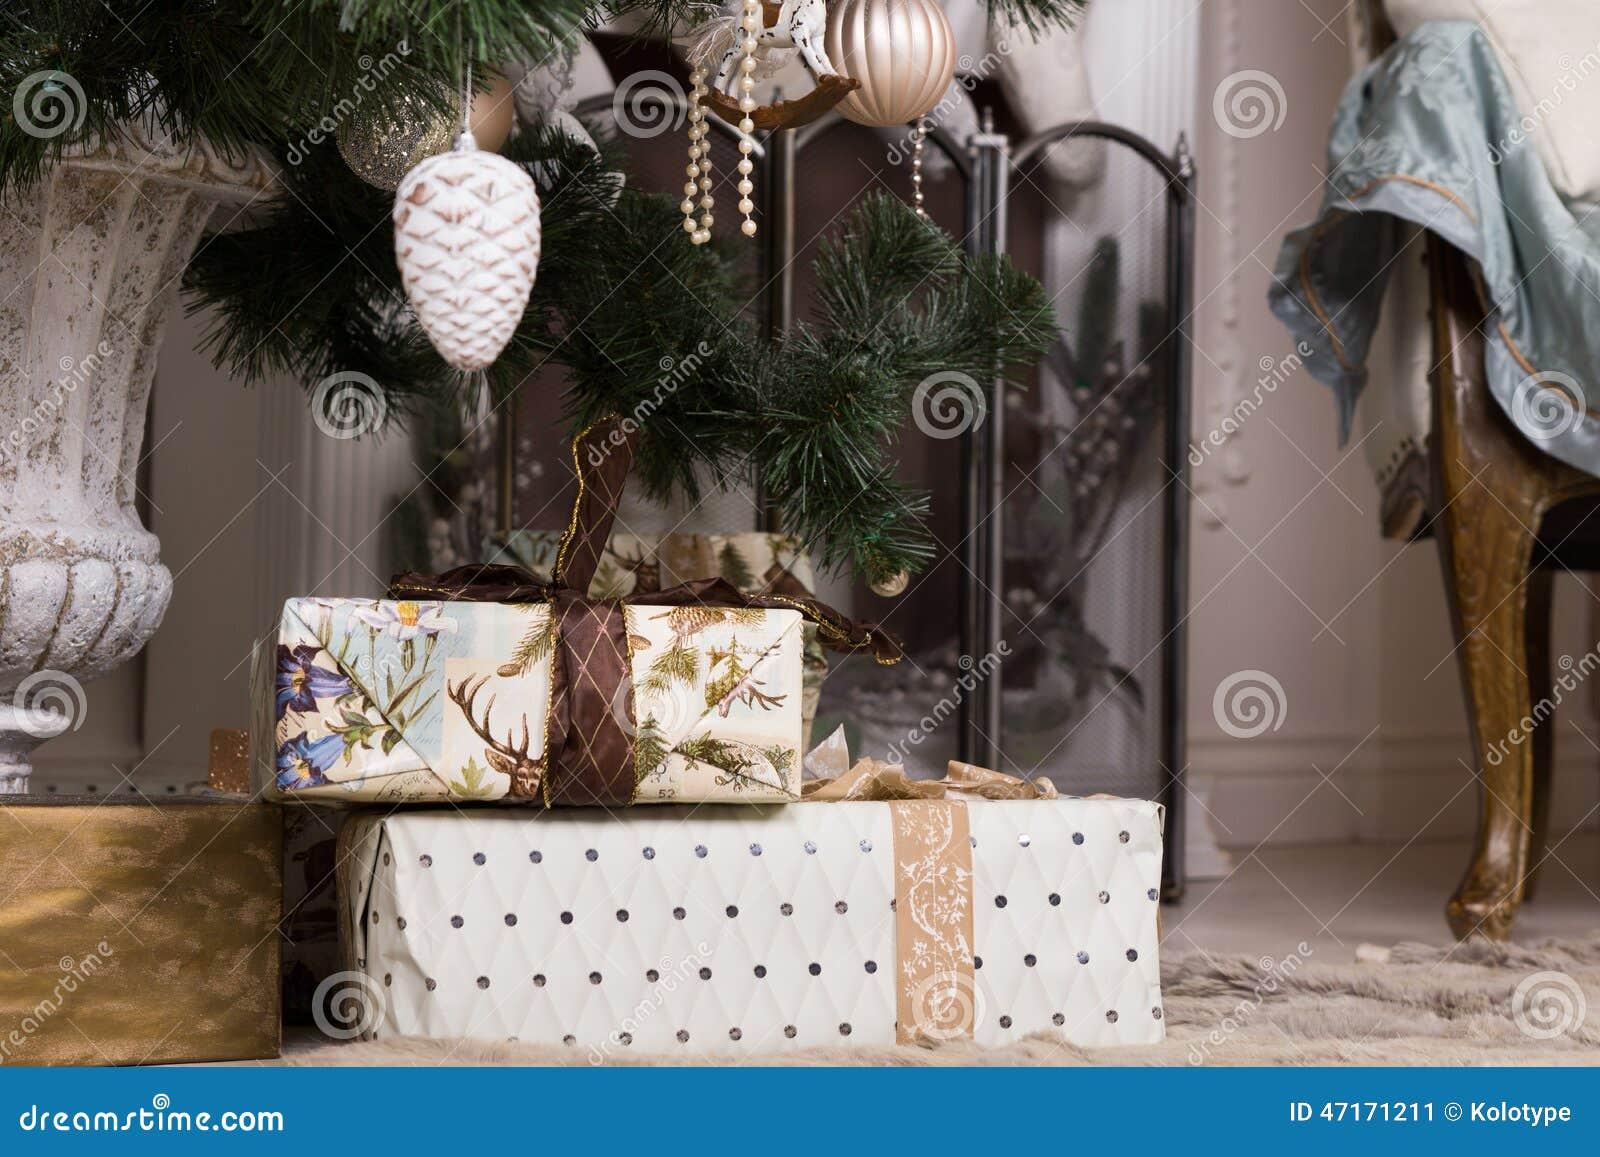 Beautiful Christmas Gifts Below Christmas Tree Stock Photo ...